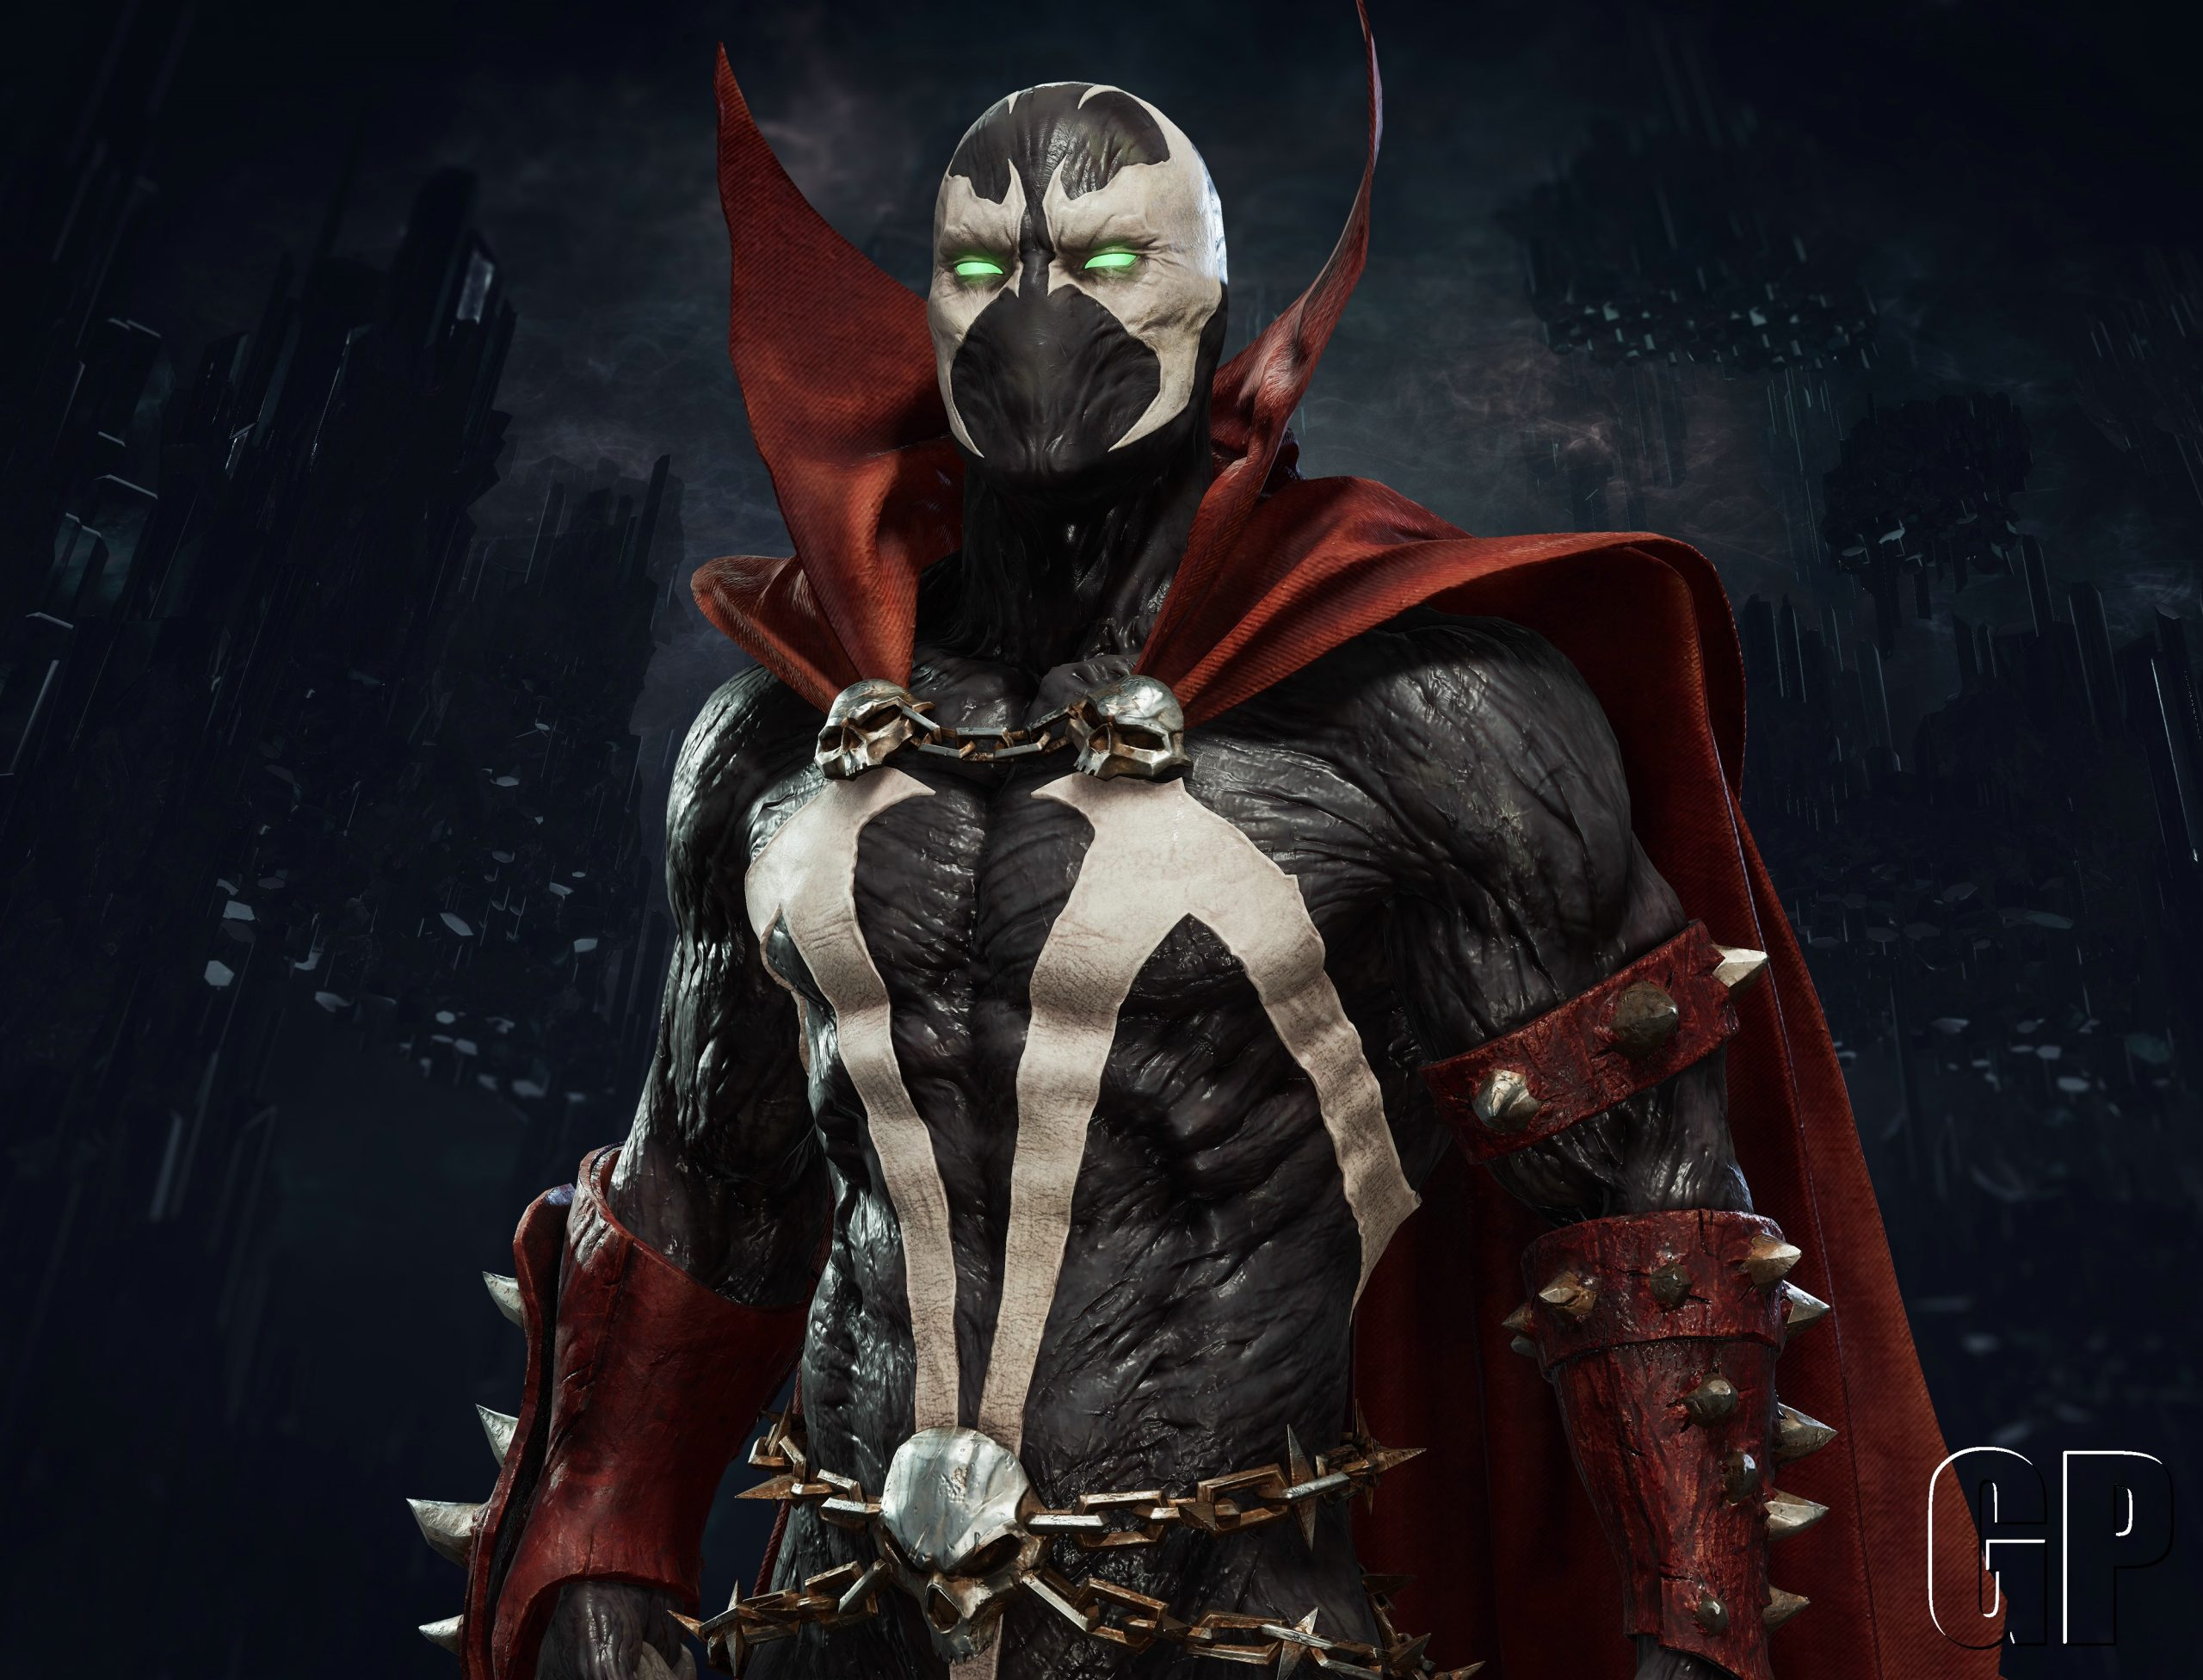 Raiden Looks Godly in New Mortal Kombat 11 Render